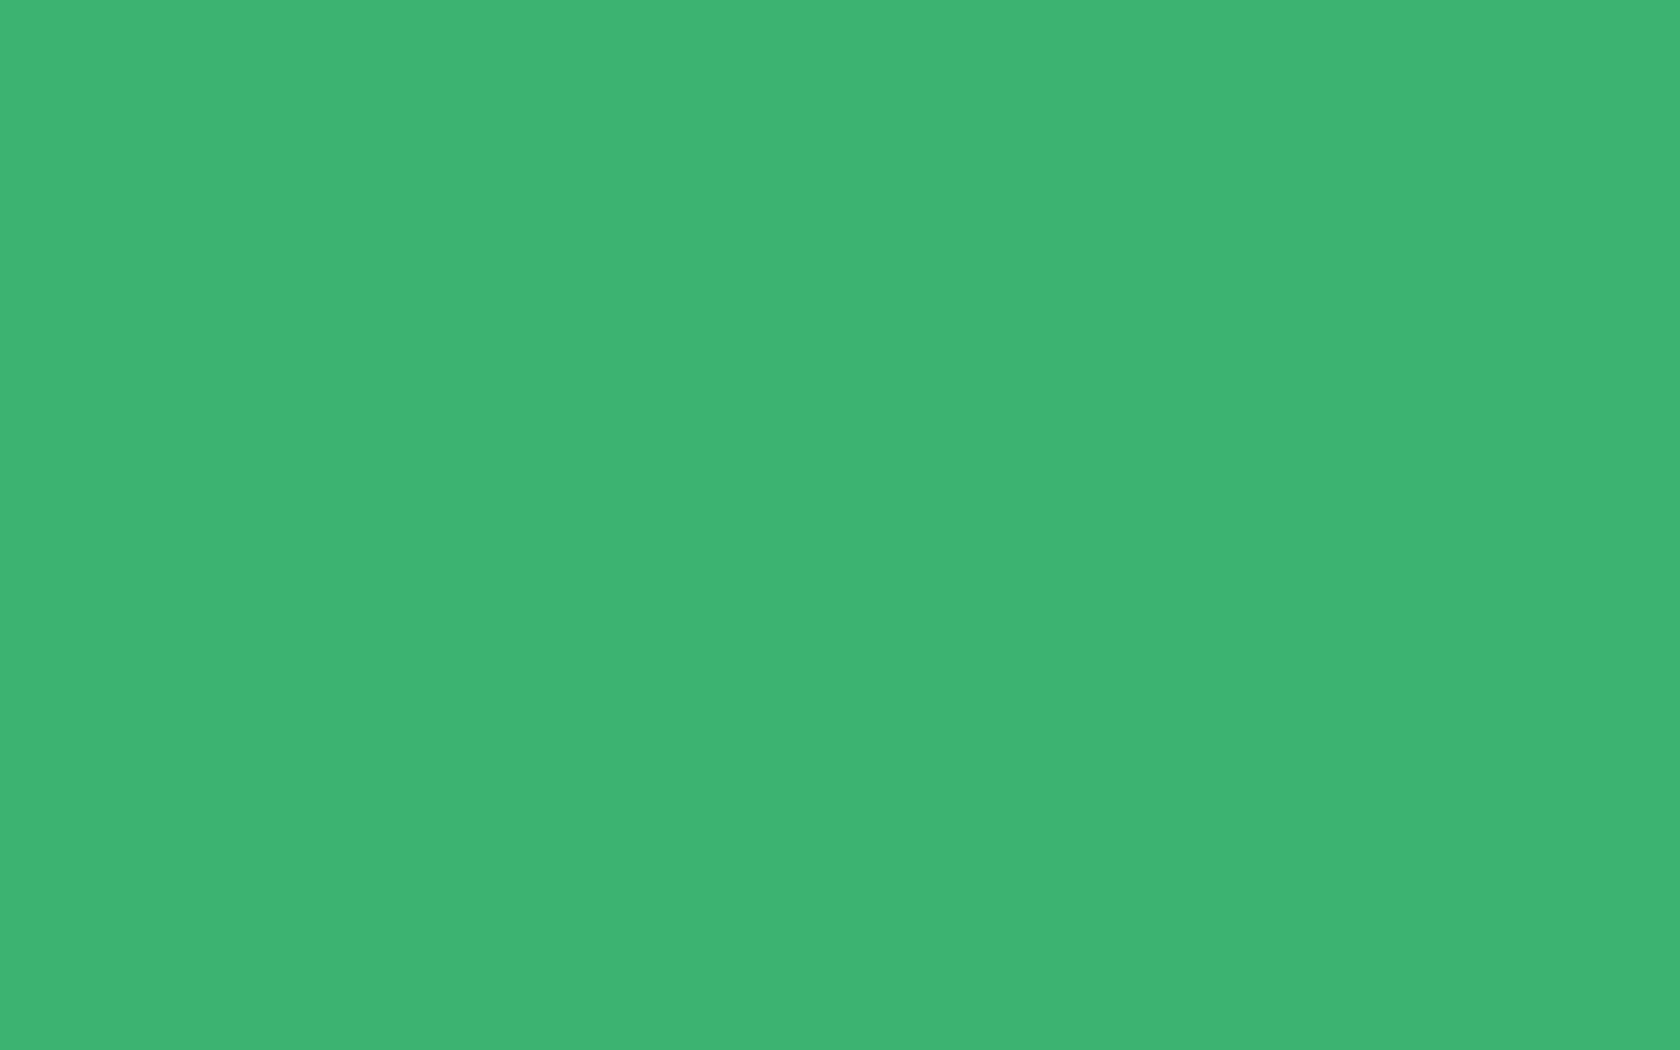 1680x1050 Medium Sea Green Solid Color Background